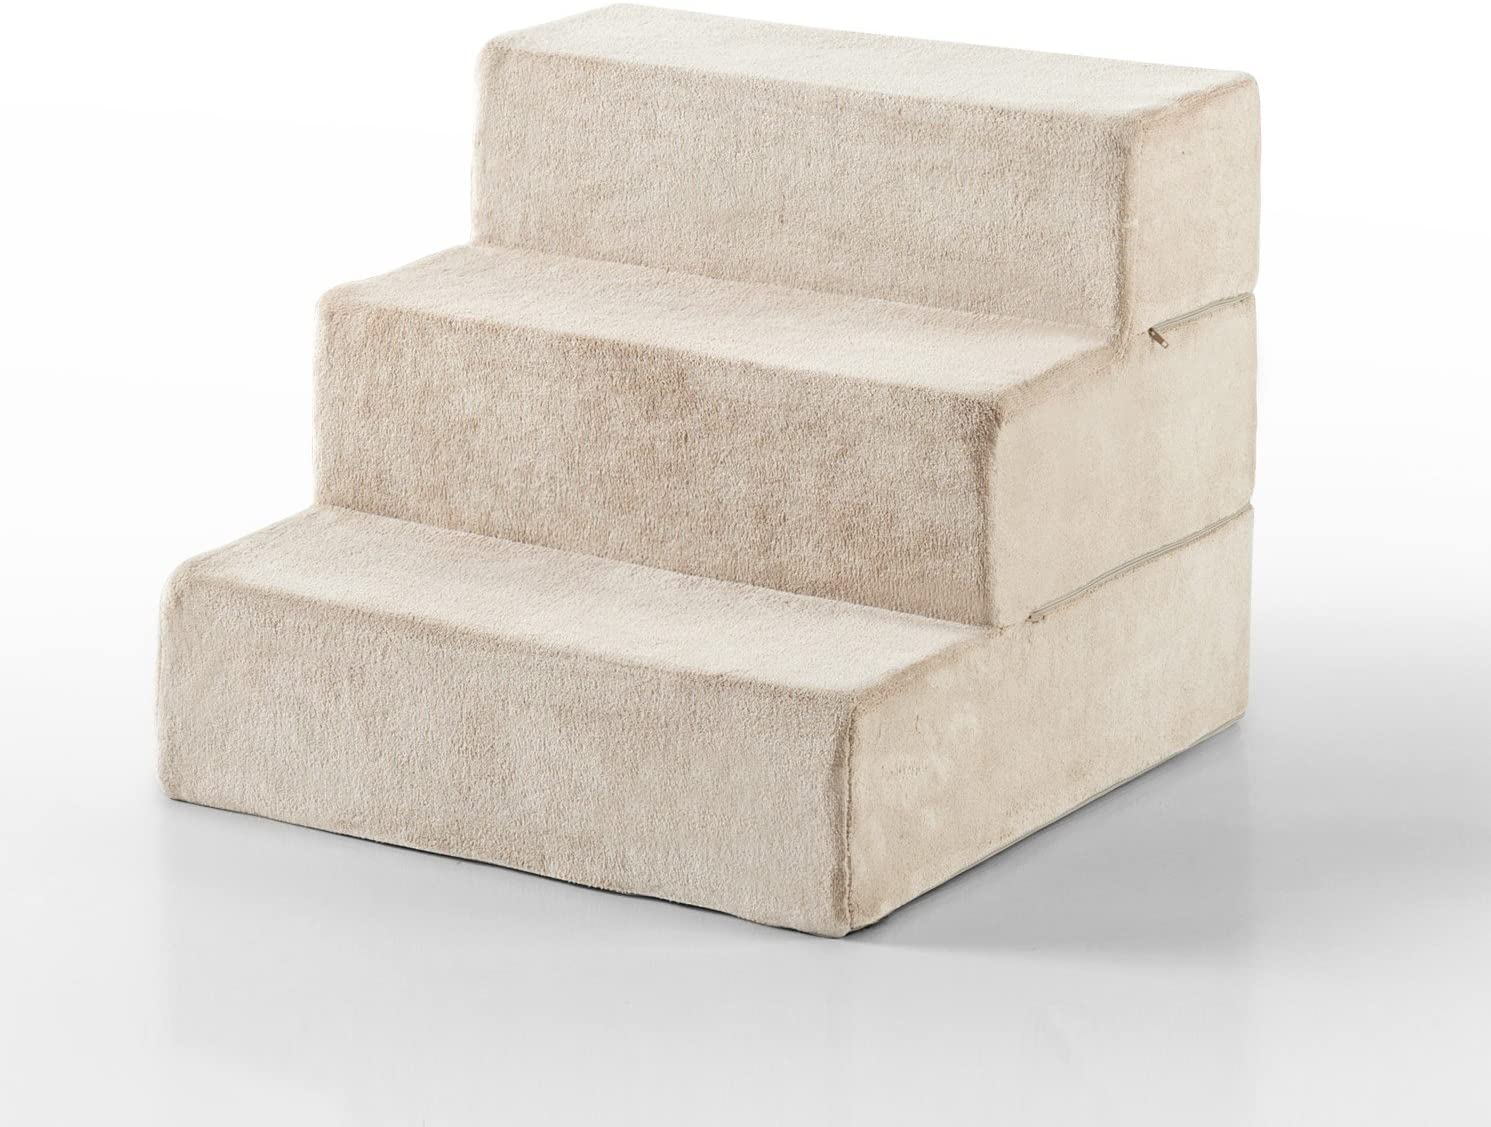 Zinus Step Pet Stairs